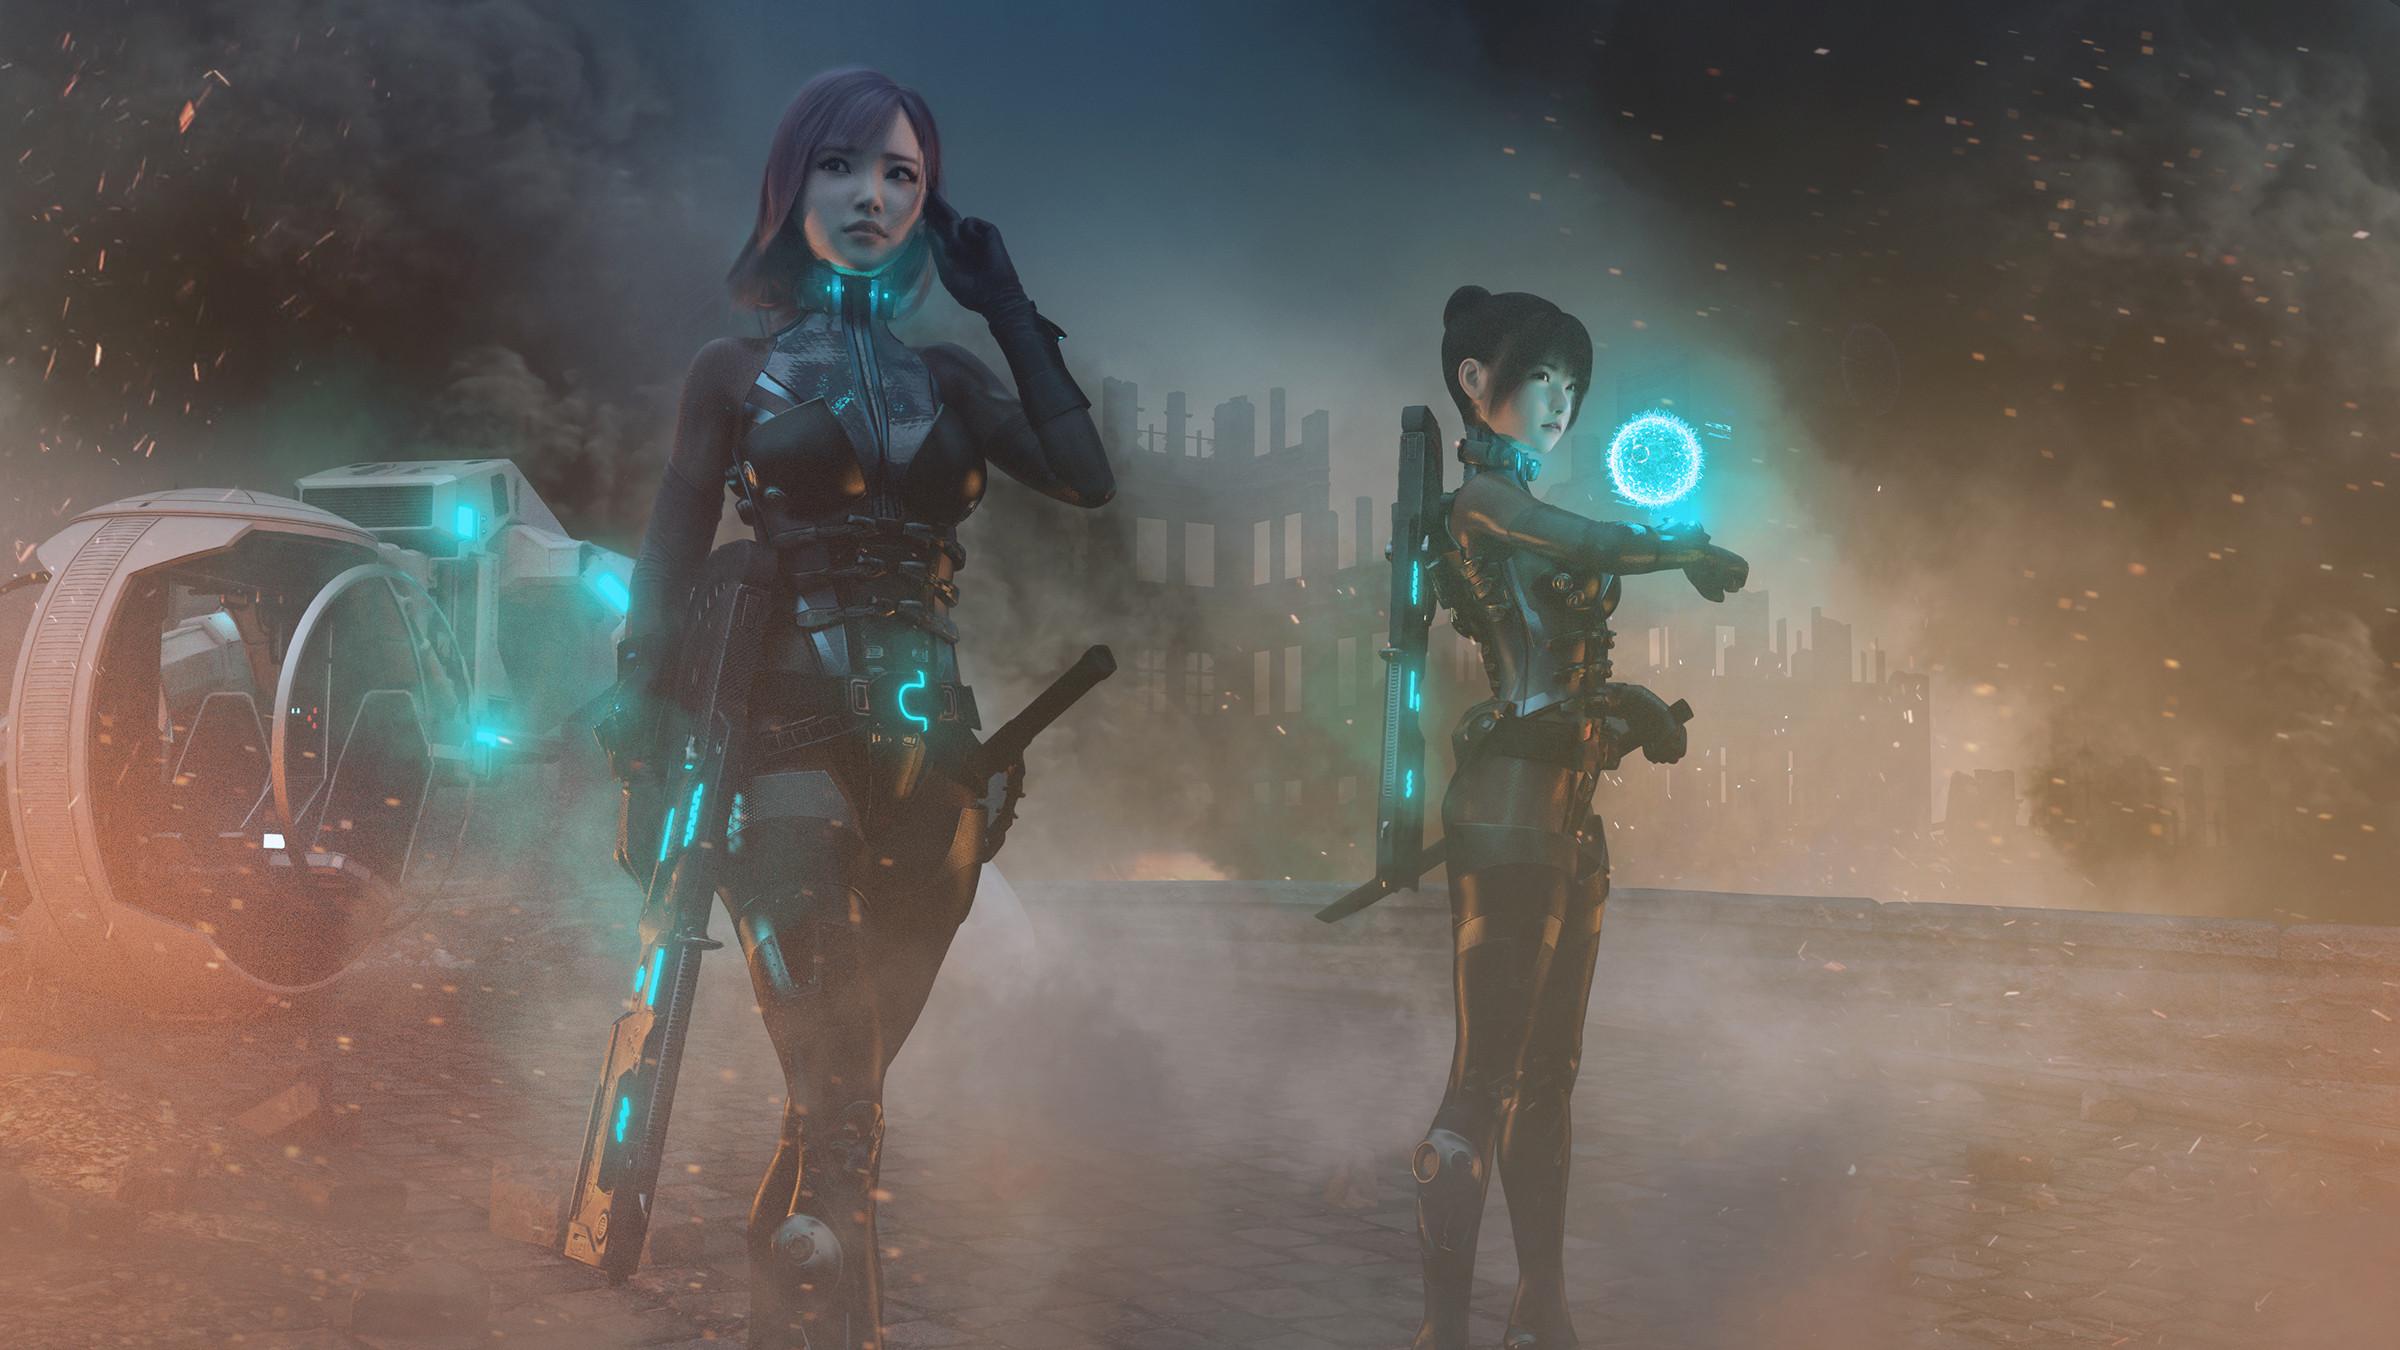 General 2400x1350 Lou LL digital art artwork futuristic hologram weapon soldier science fiction cyan